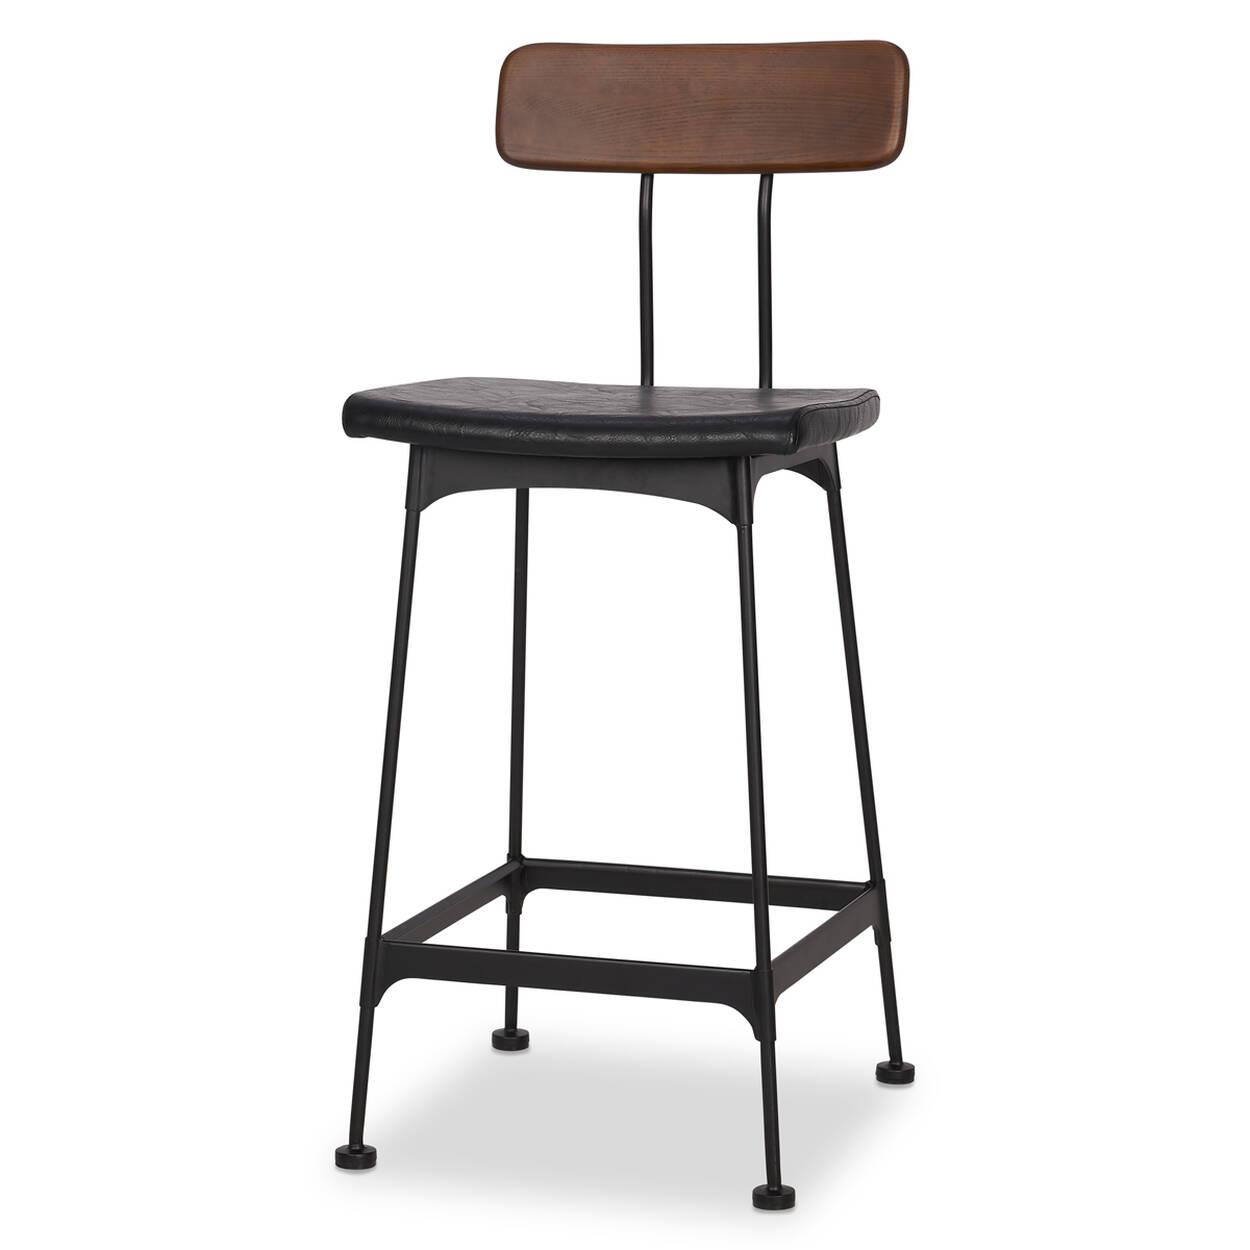 Swell Gleason Counter Stool Black Beatyapartments Chair Design Images Beatyapartmentscom